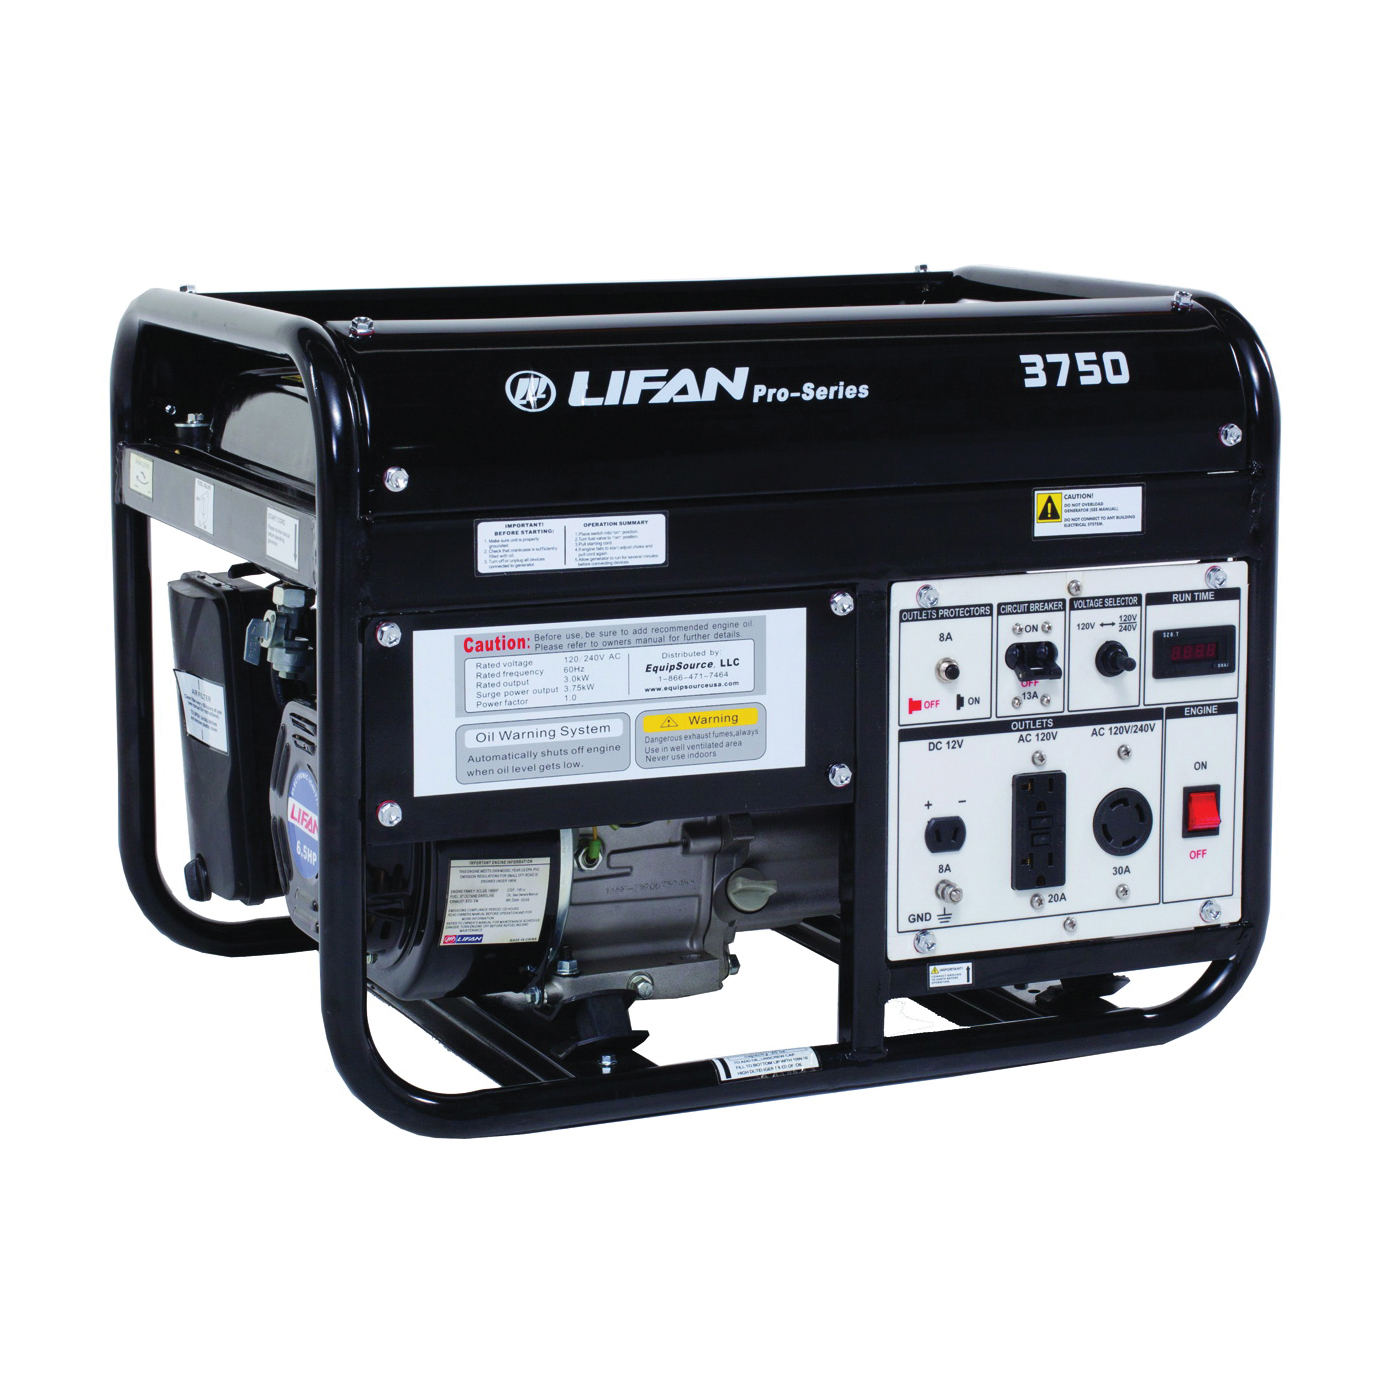 LIFAN LF3750